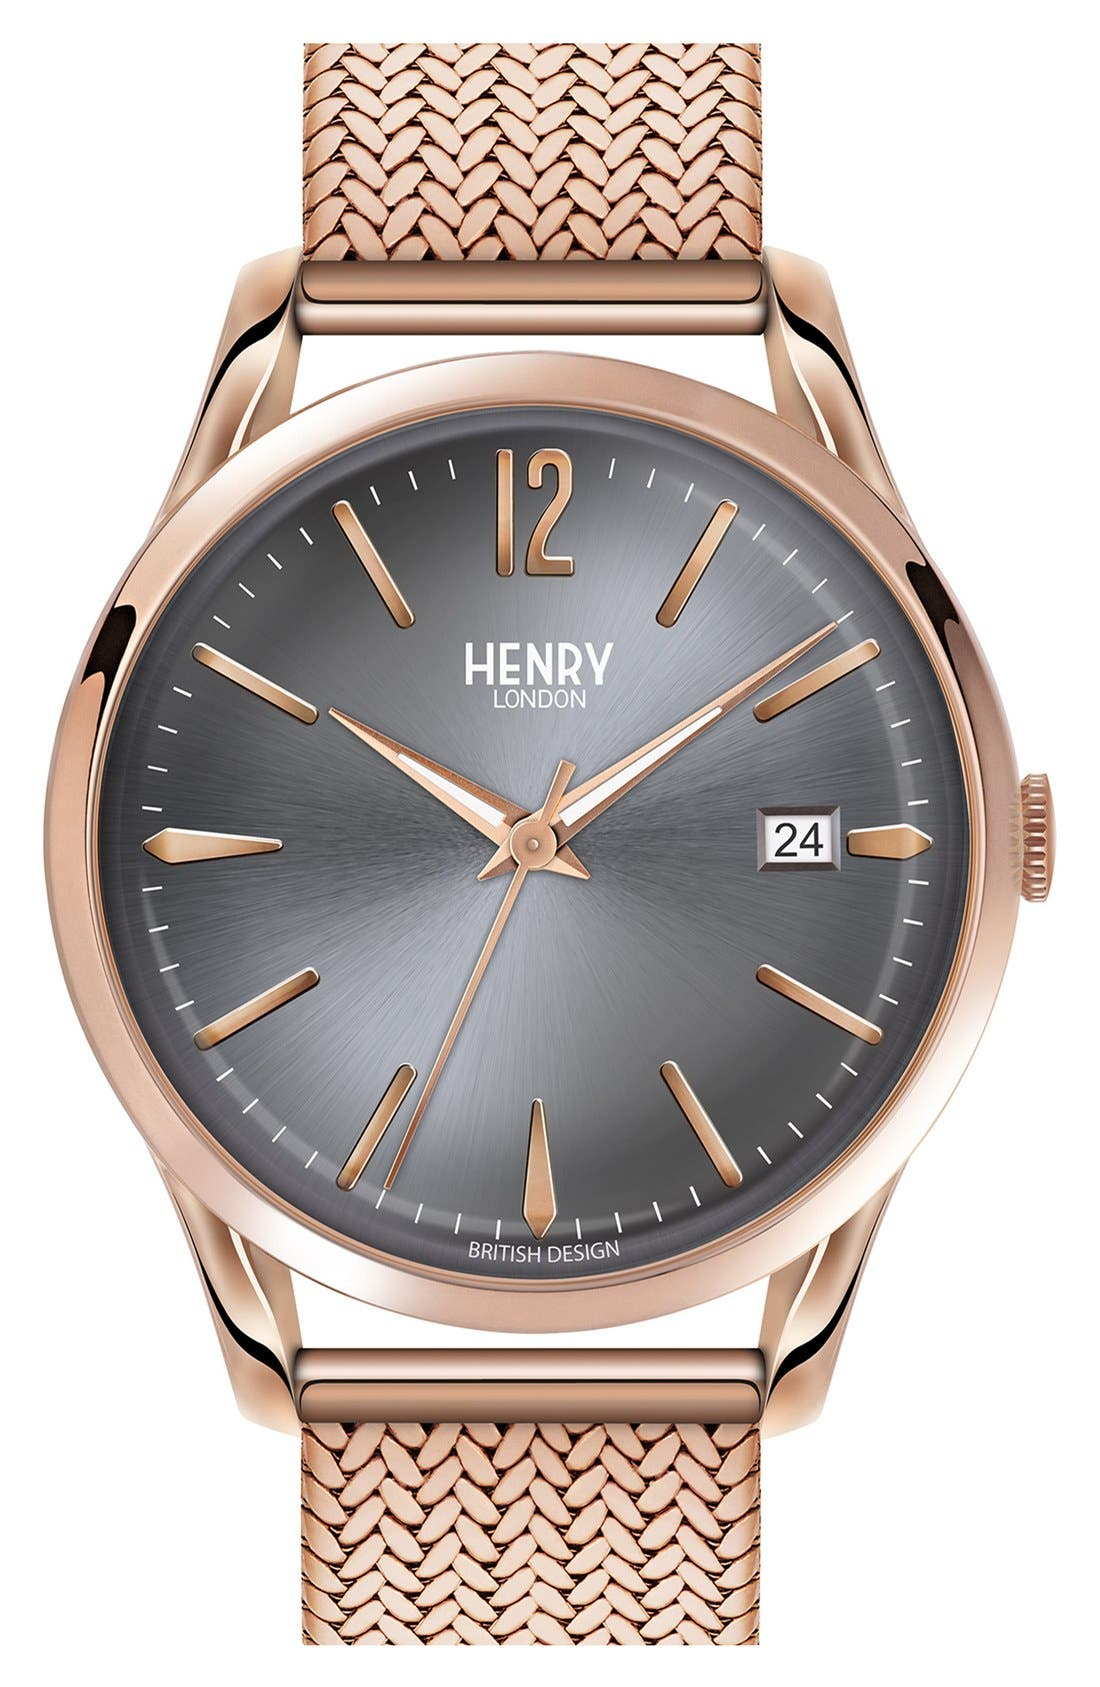 Henry London 'Finchley' Analog Mesh Strap Watch, 38mm